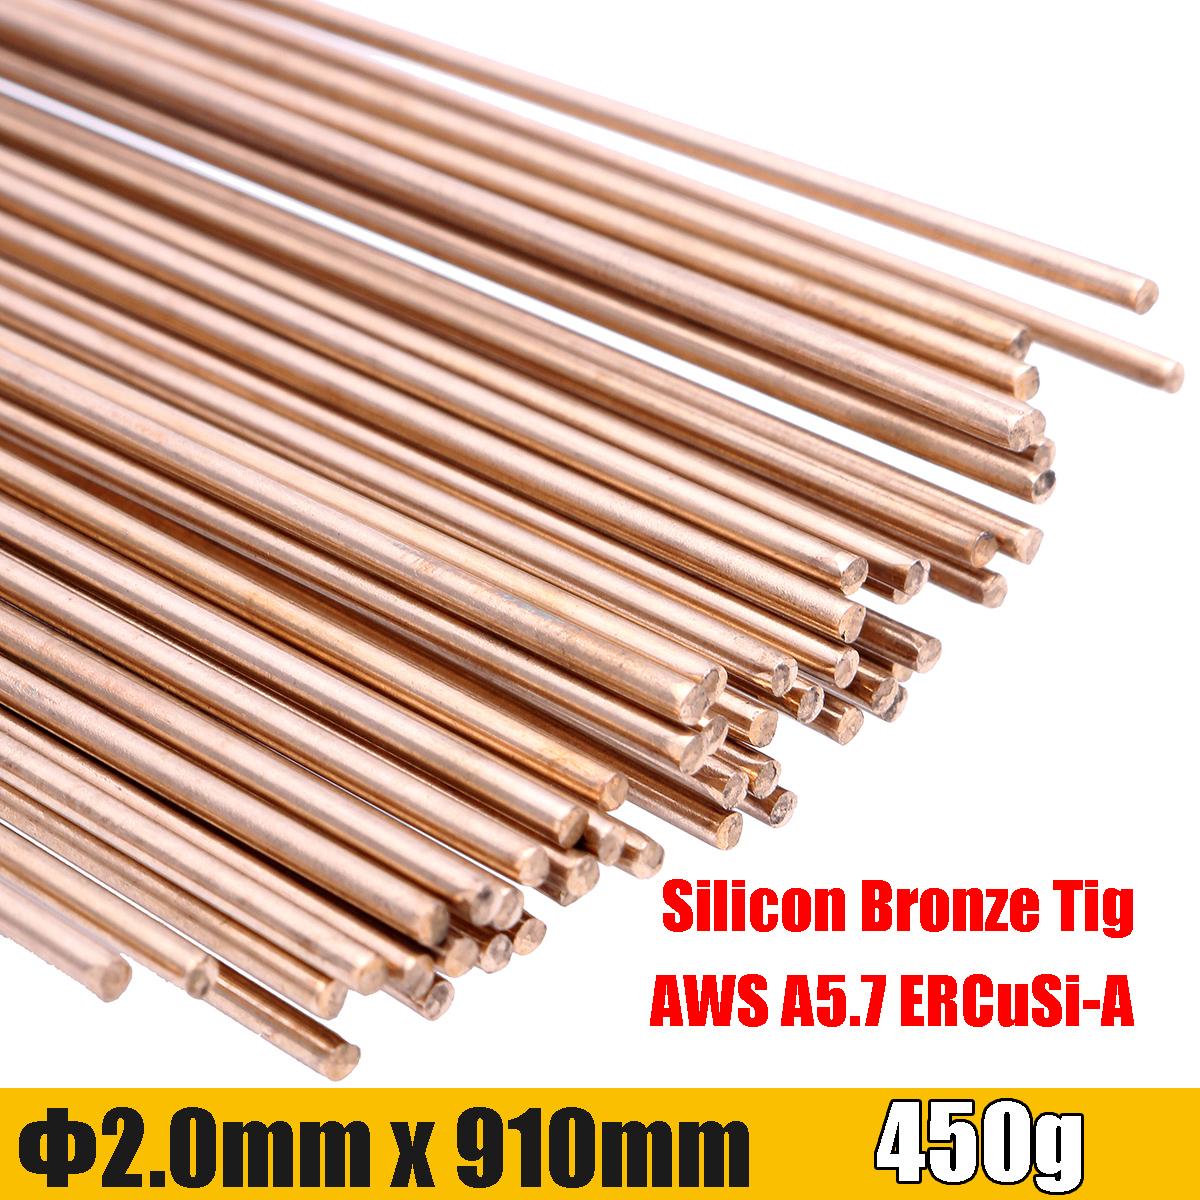 450g 3//32inch Gold Silicon Bronze Tig Welding Rods 91cm Long Rod 2mm Diameter 50